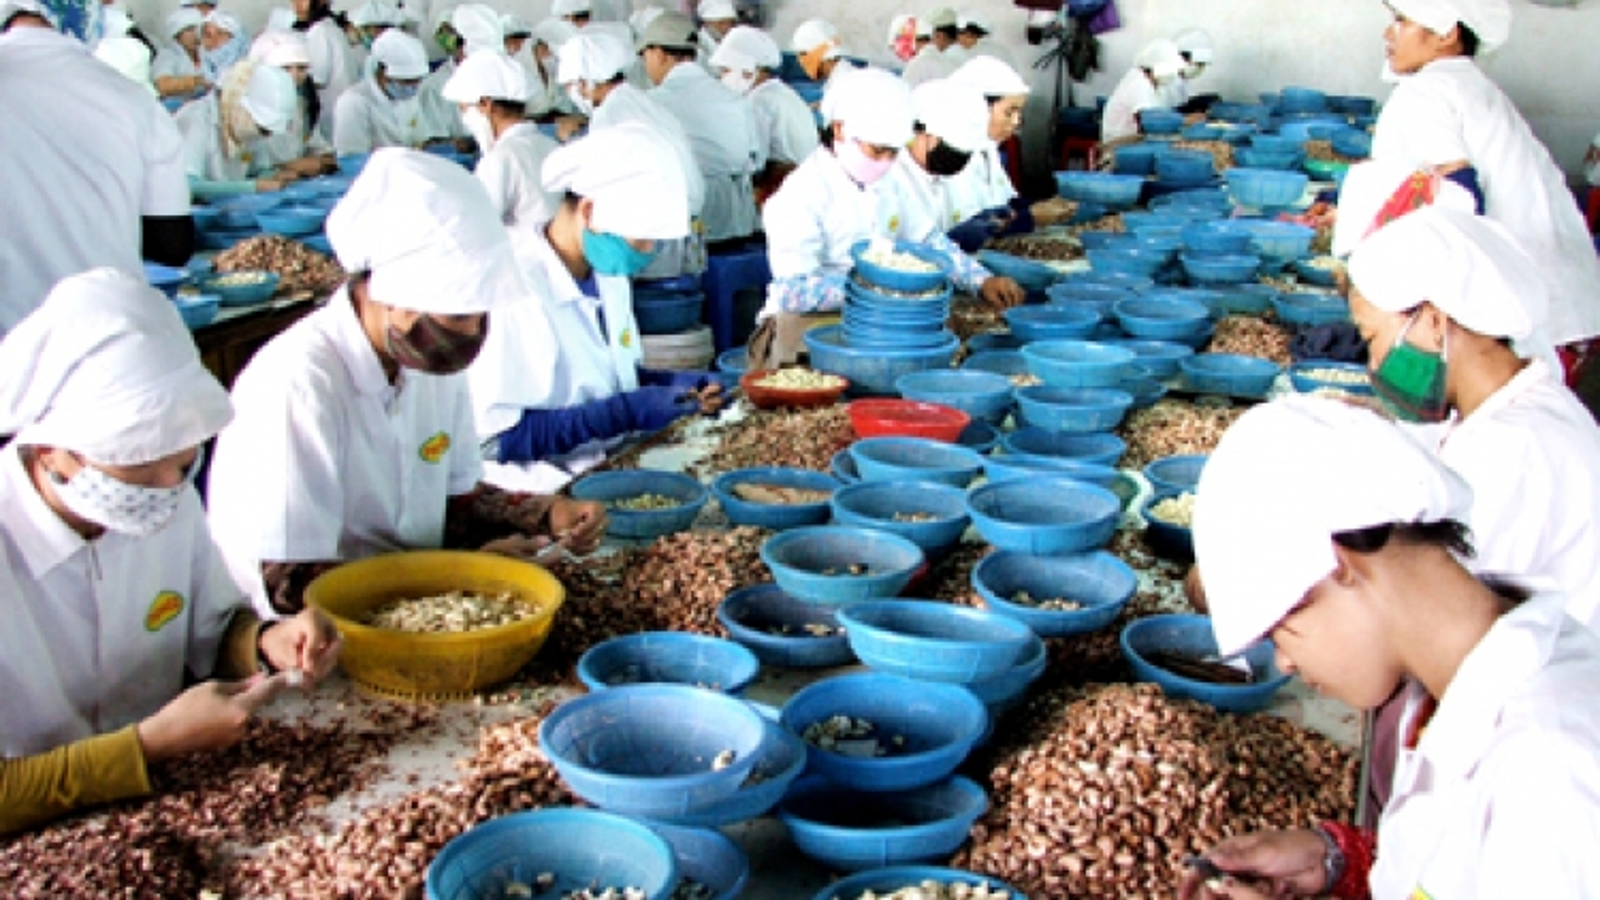 Africa represents potential market for Vietnamese goods